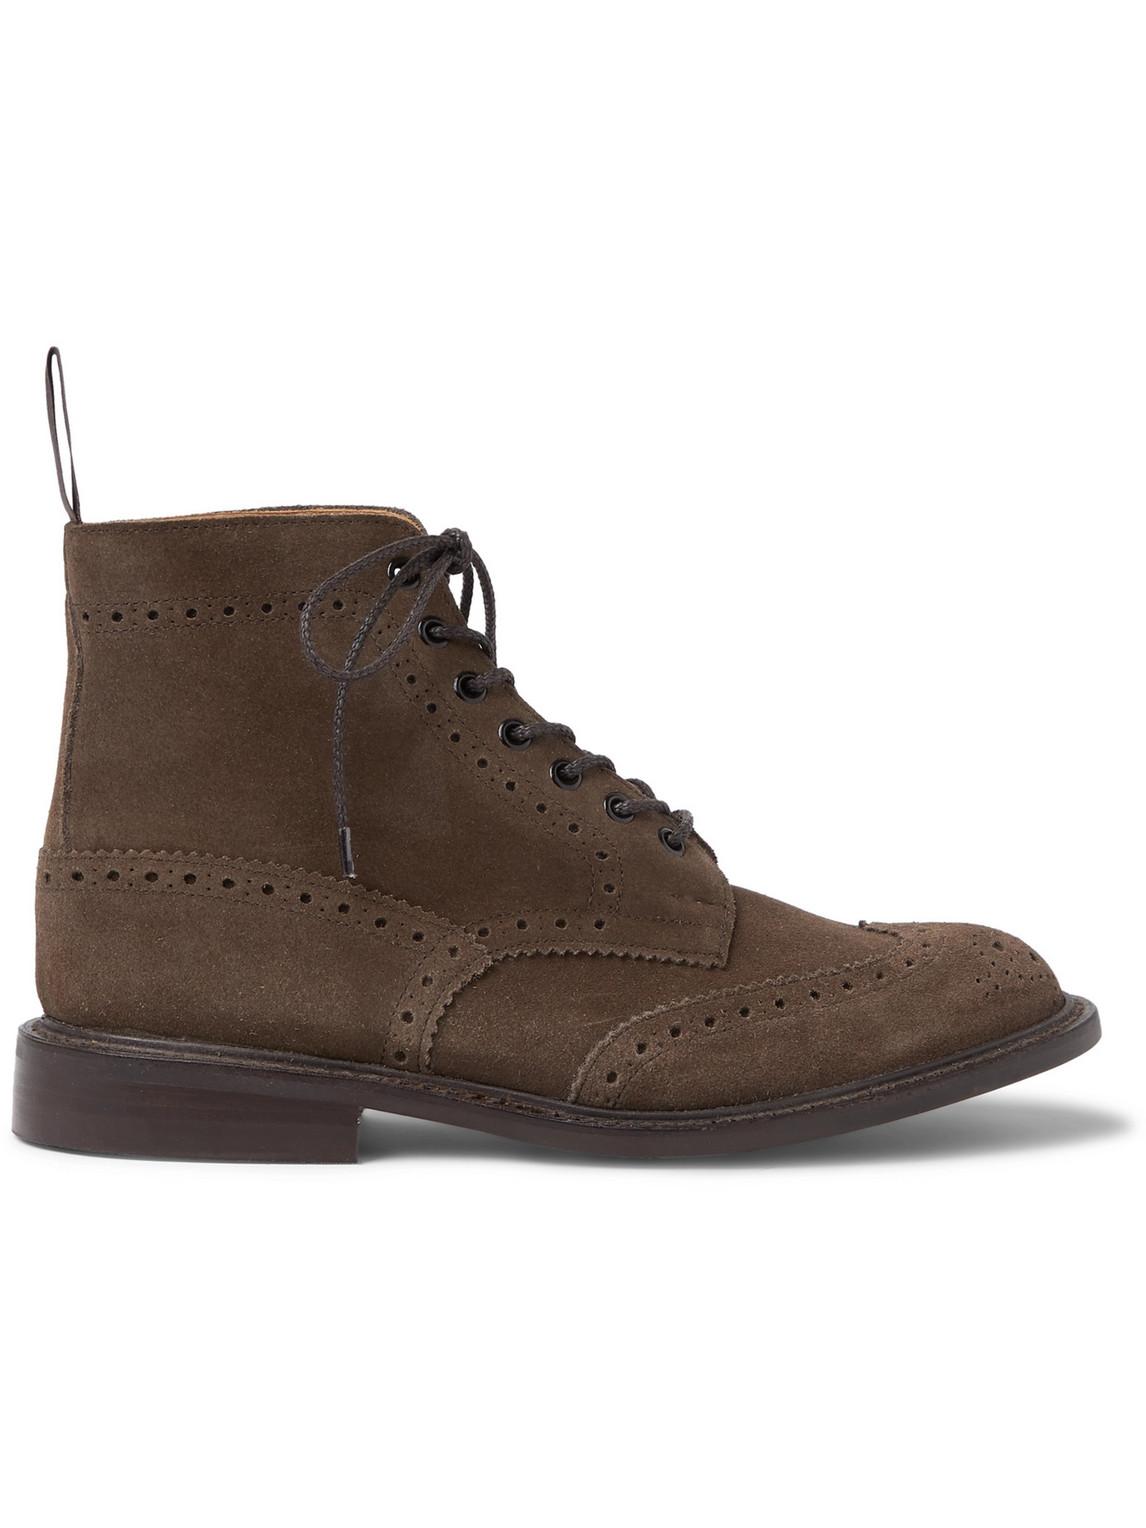 Tricker's - Stow Suede Brogue Boots - Men - Brown - 10